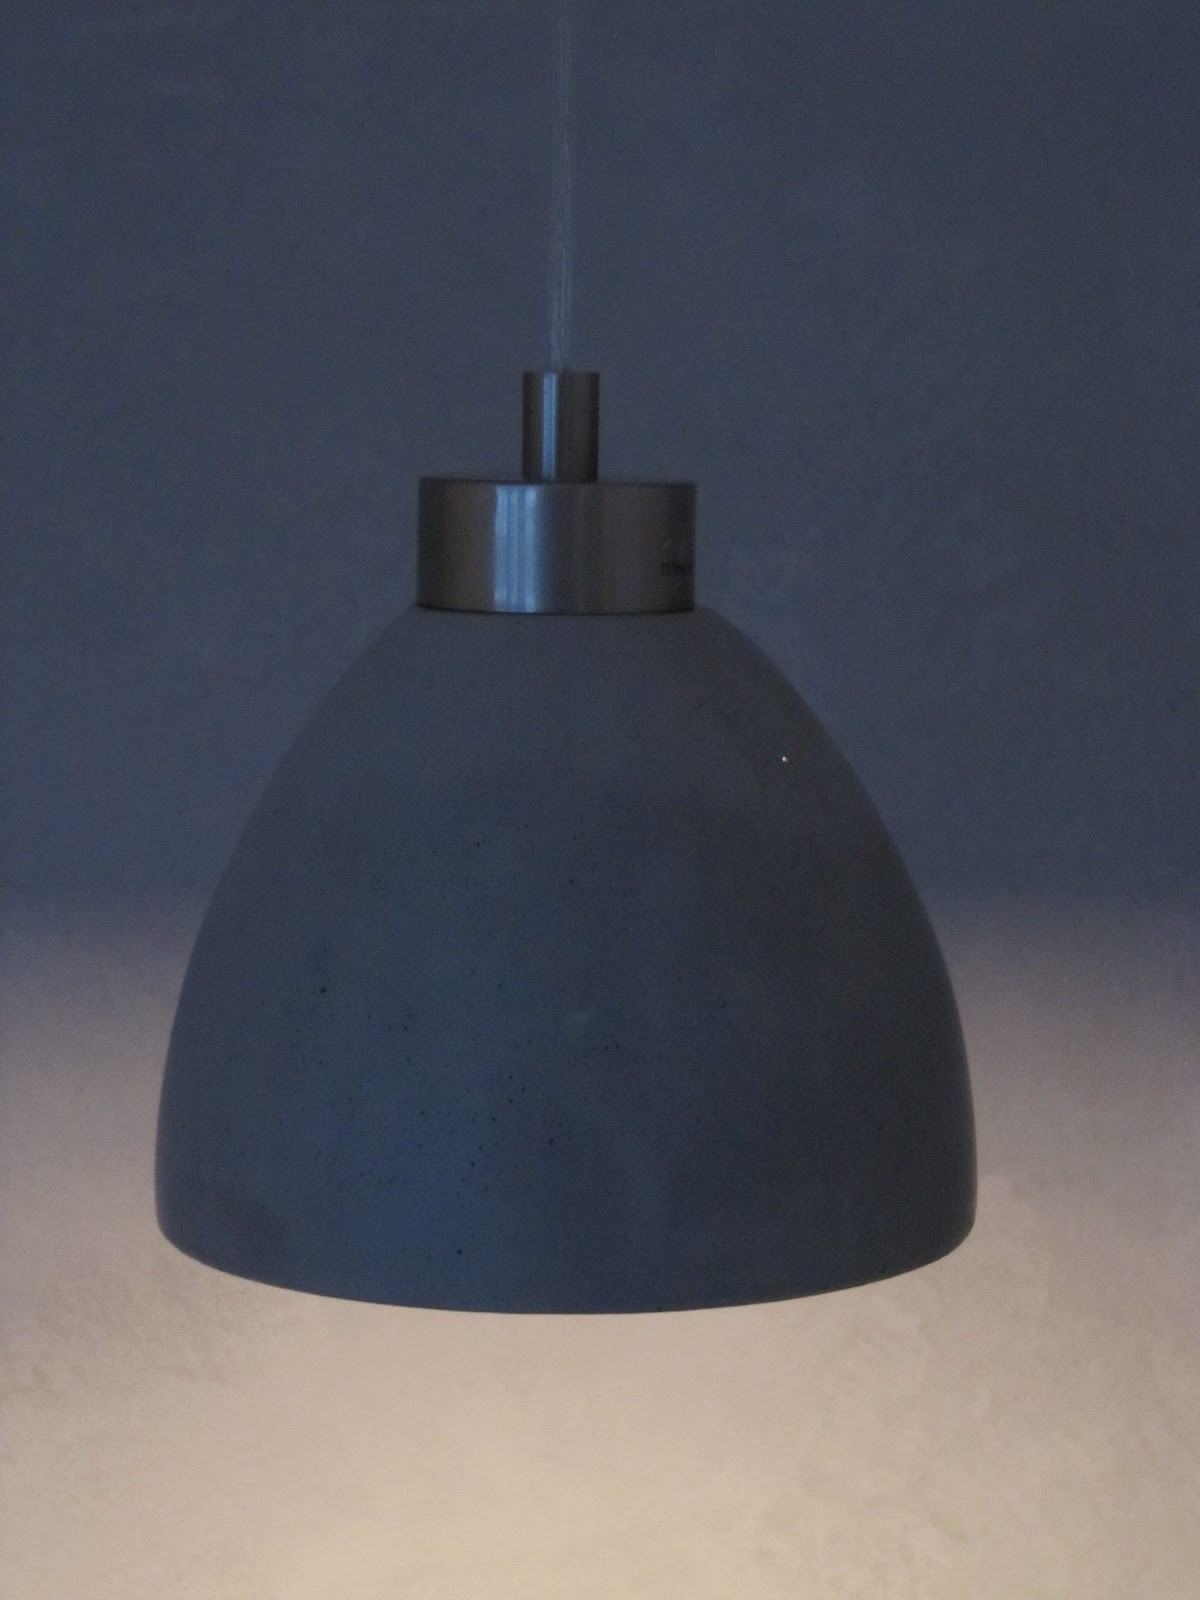 beton unique beton cire betonlampe pendellampe. Black Bedroom Furniture Sets. Home Design Ideas